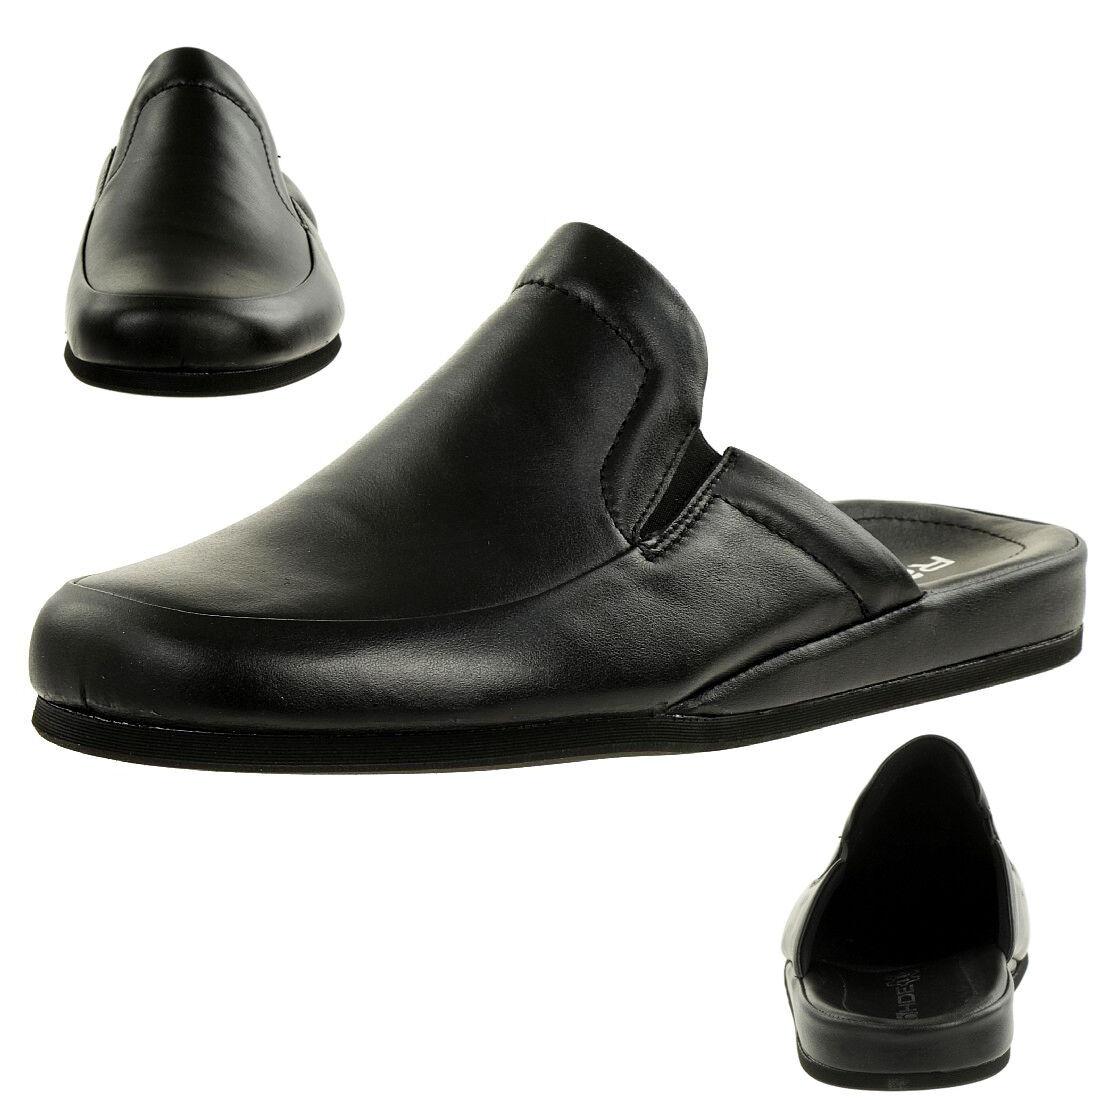 Rohde Varberg Herren Pantoffeln Hausschuhe Schuhe 6607 90 schwarz